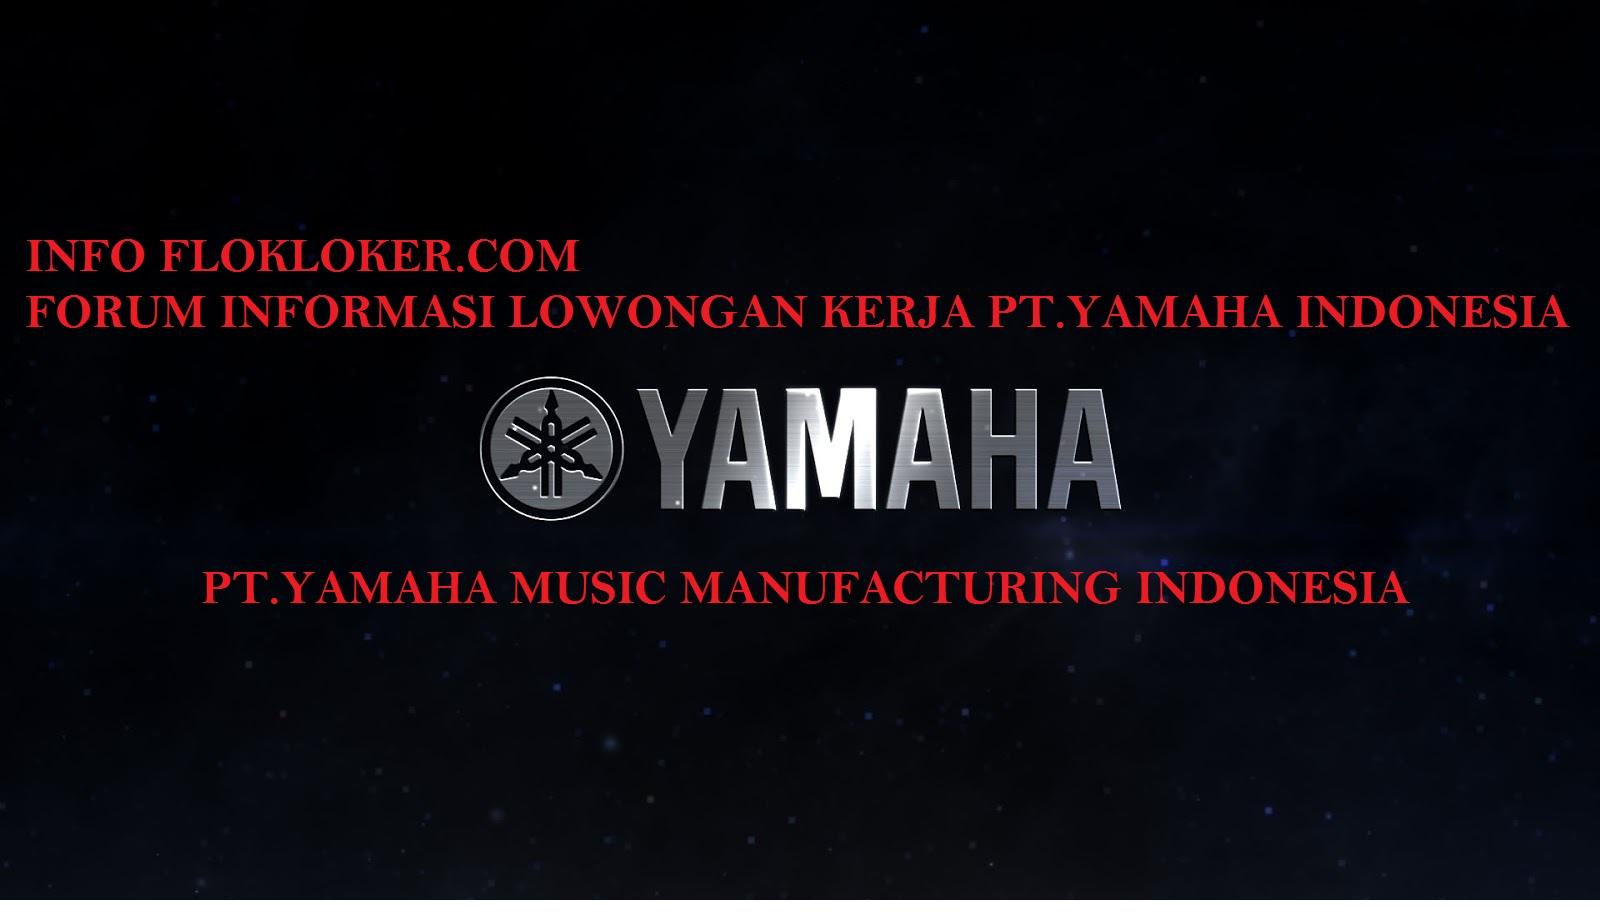 Lowongan Kerja Smk/Sma PT Yamaha Musik Indonesia Operator Produksi